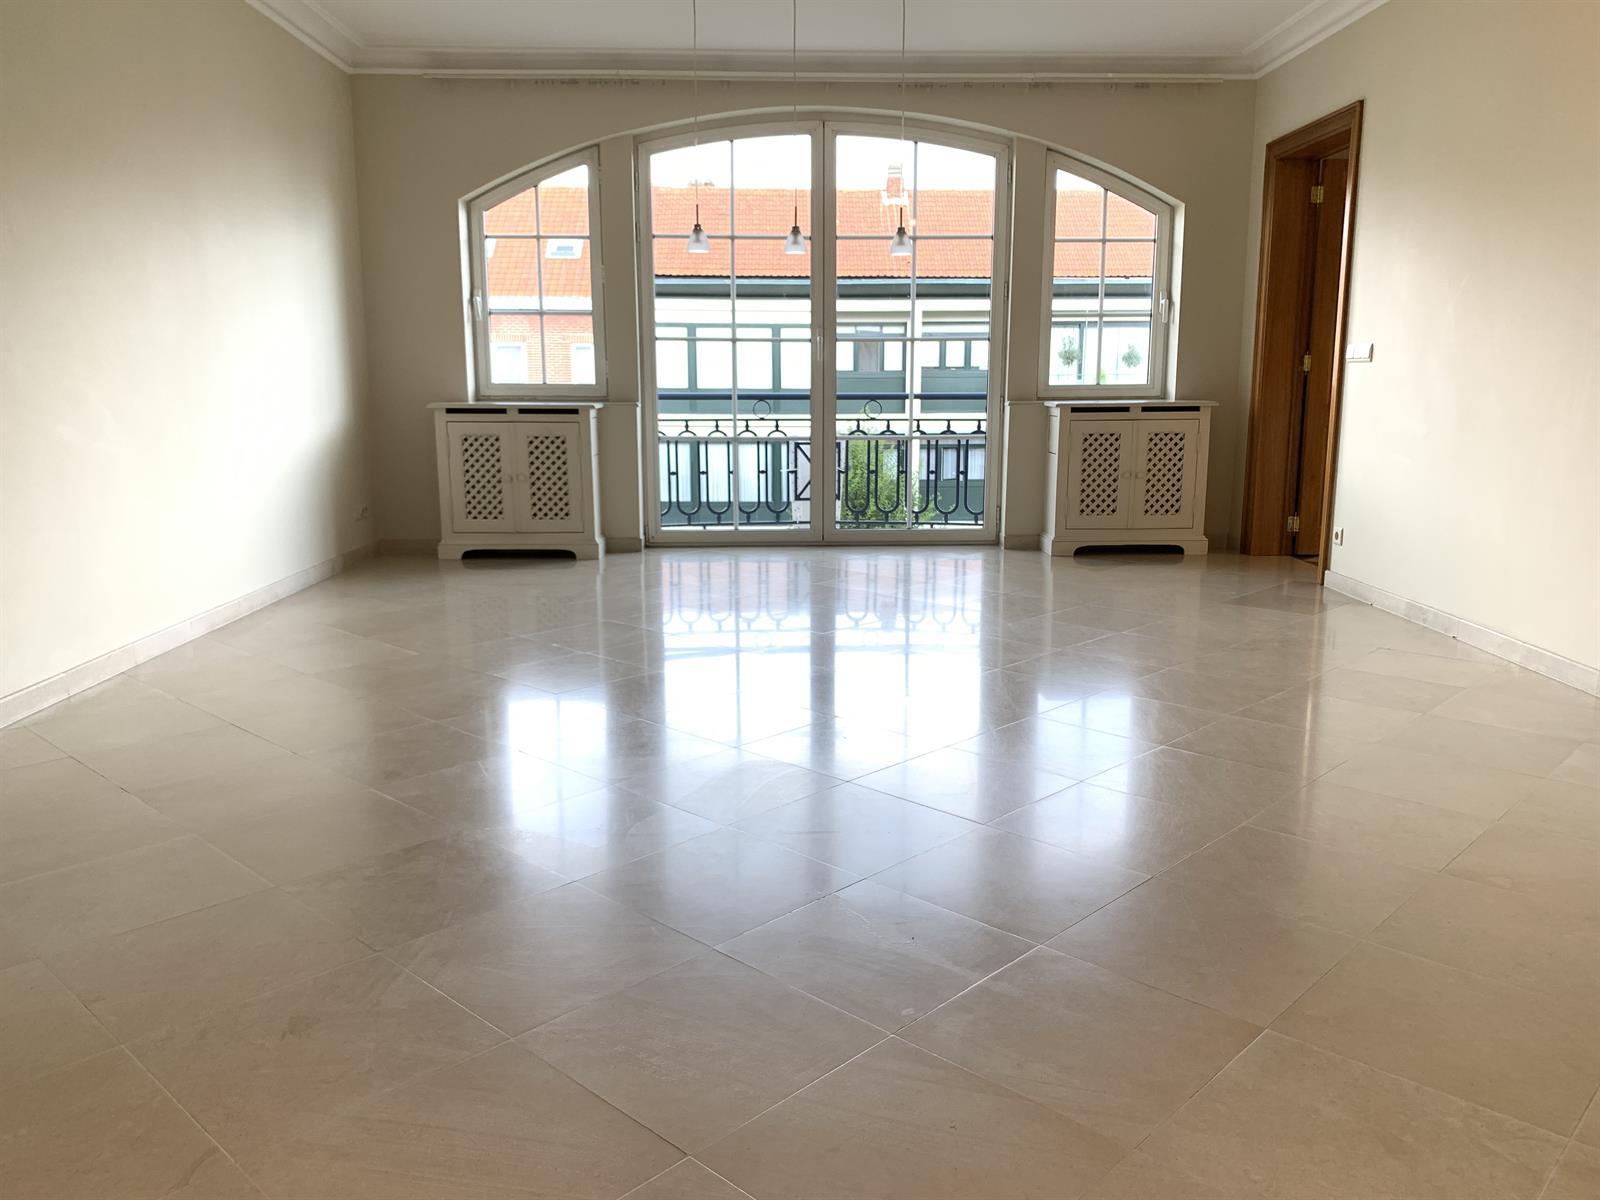 Appartement exceptionnel - Woluwe-Saint-Pierre - #4433517-22